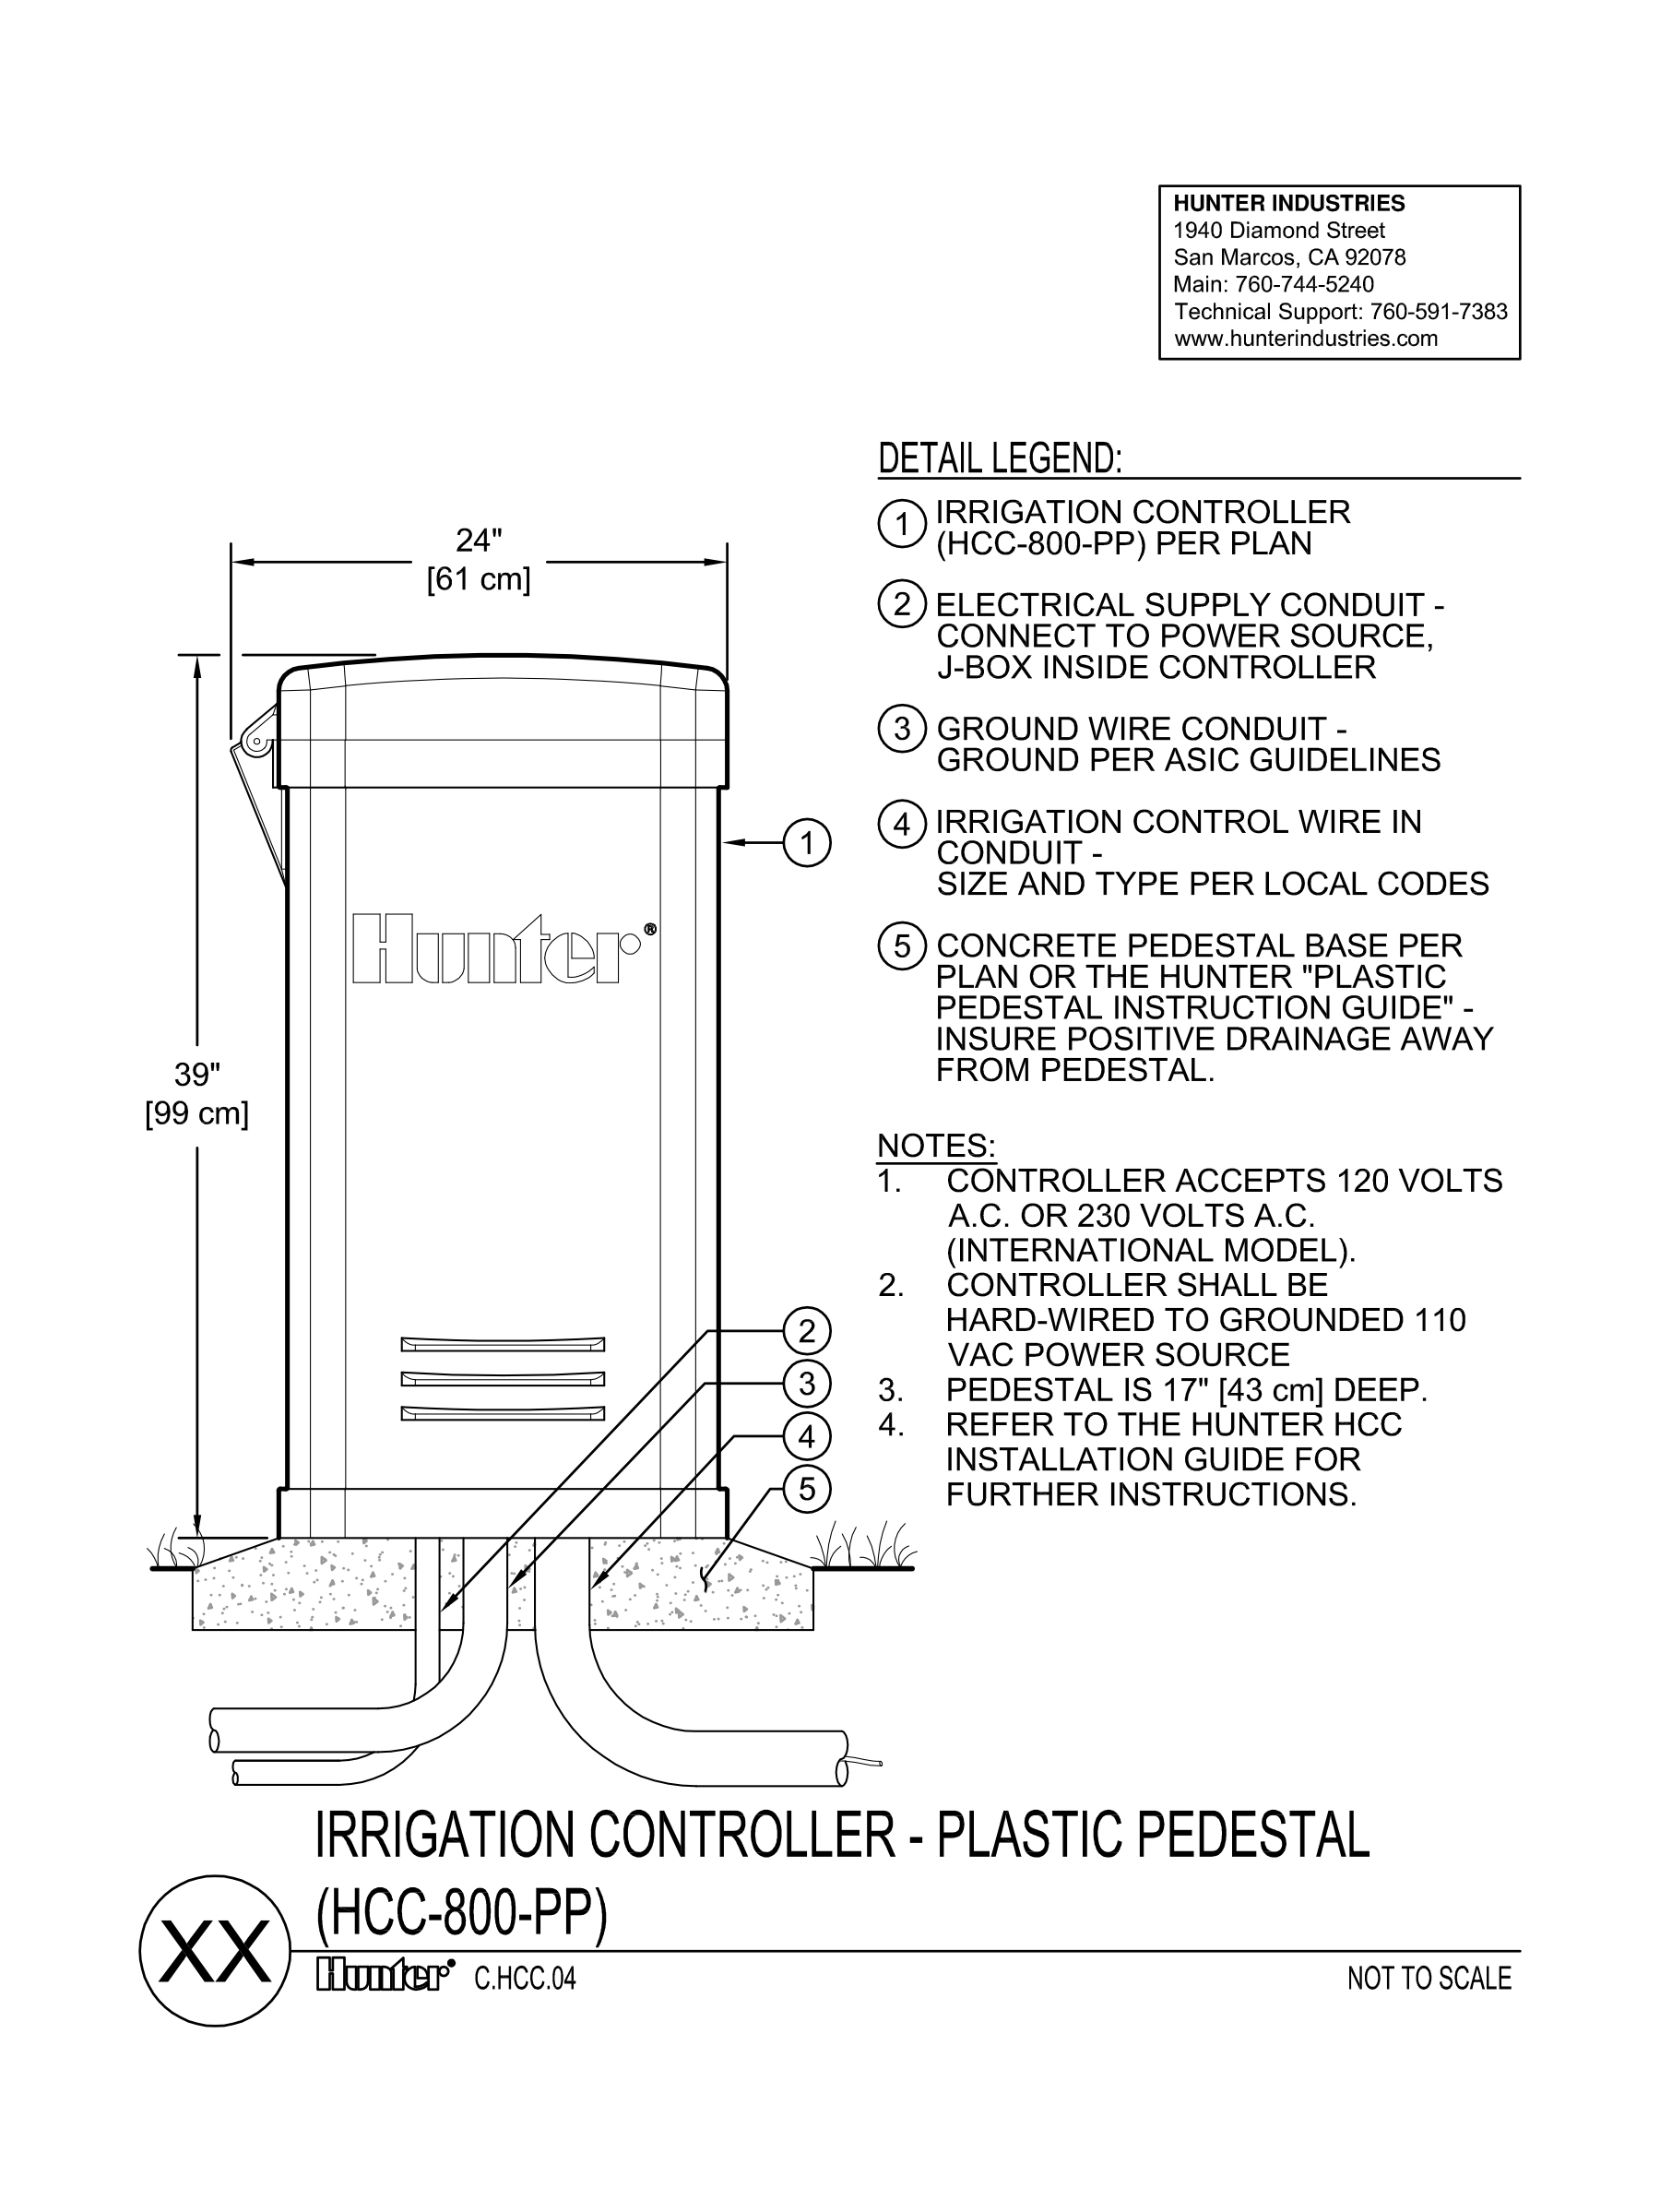 CAD - HCC Controller - Plastic Pedestal